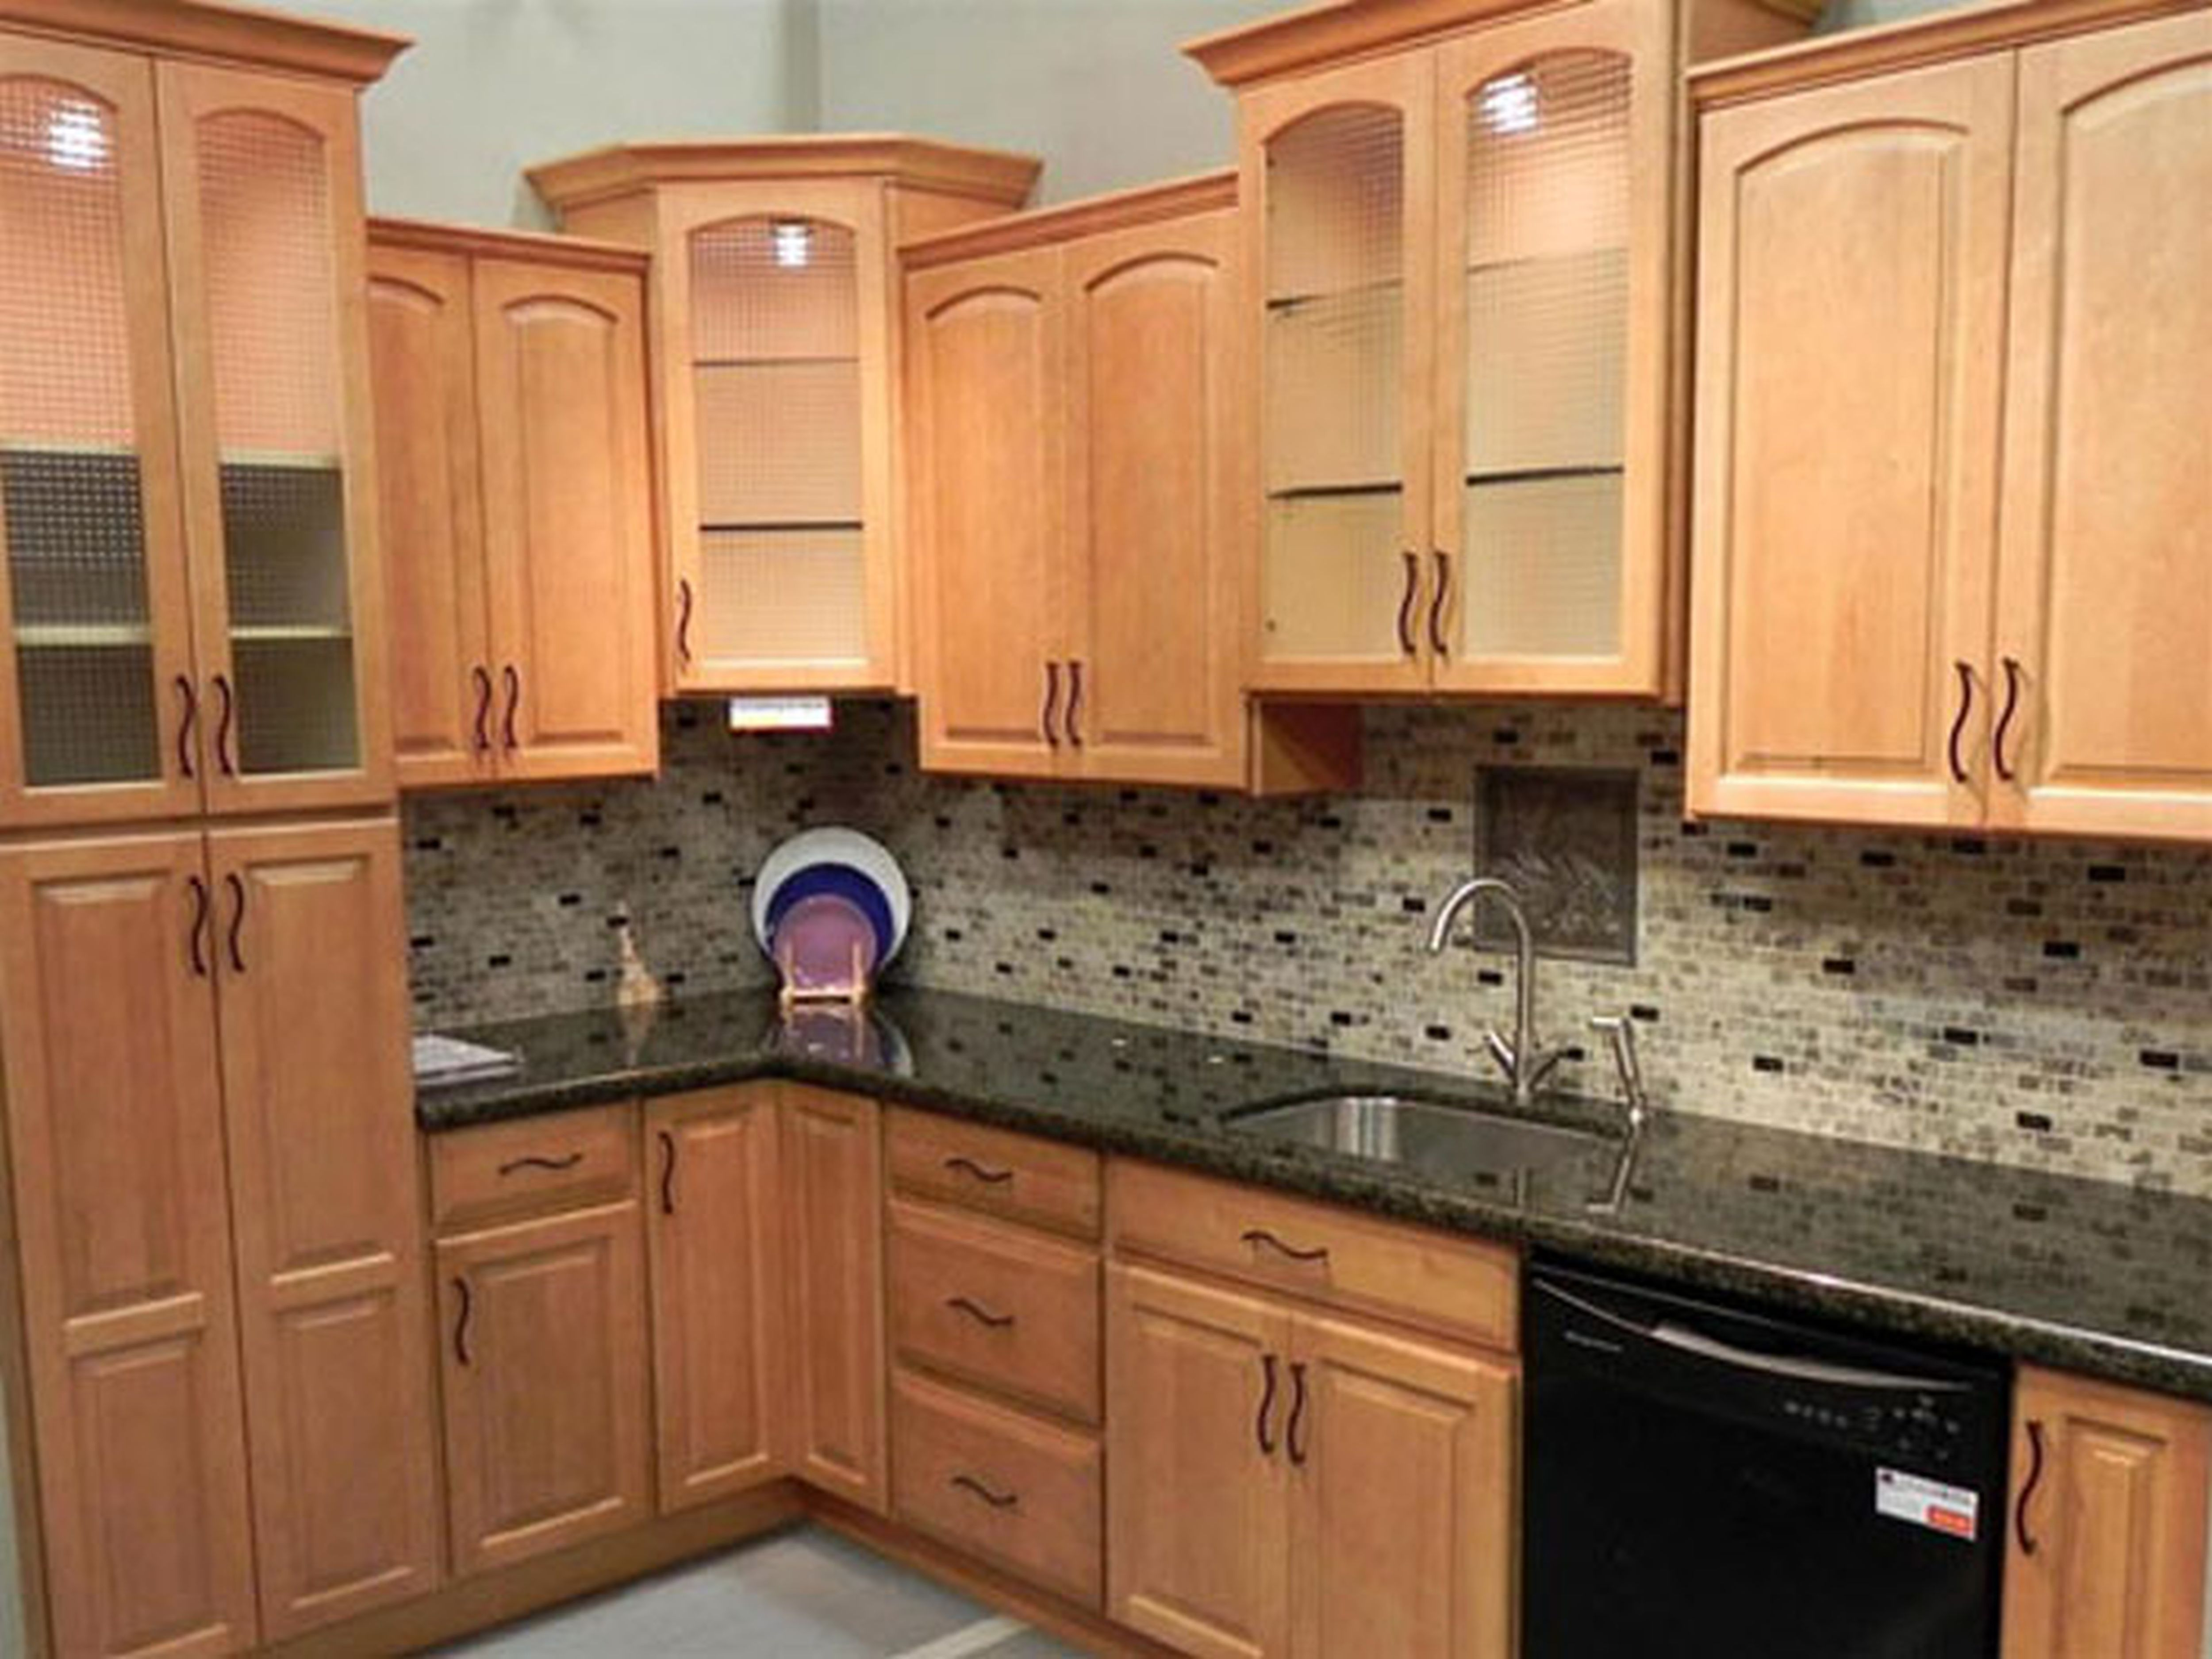 Backsplash Ideas For Grey Countertops | ... Grey Countertops Also Light Grey  Backsplash: Extraordinary Top Kitchen